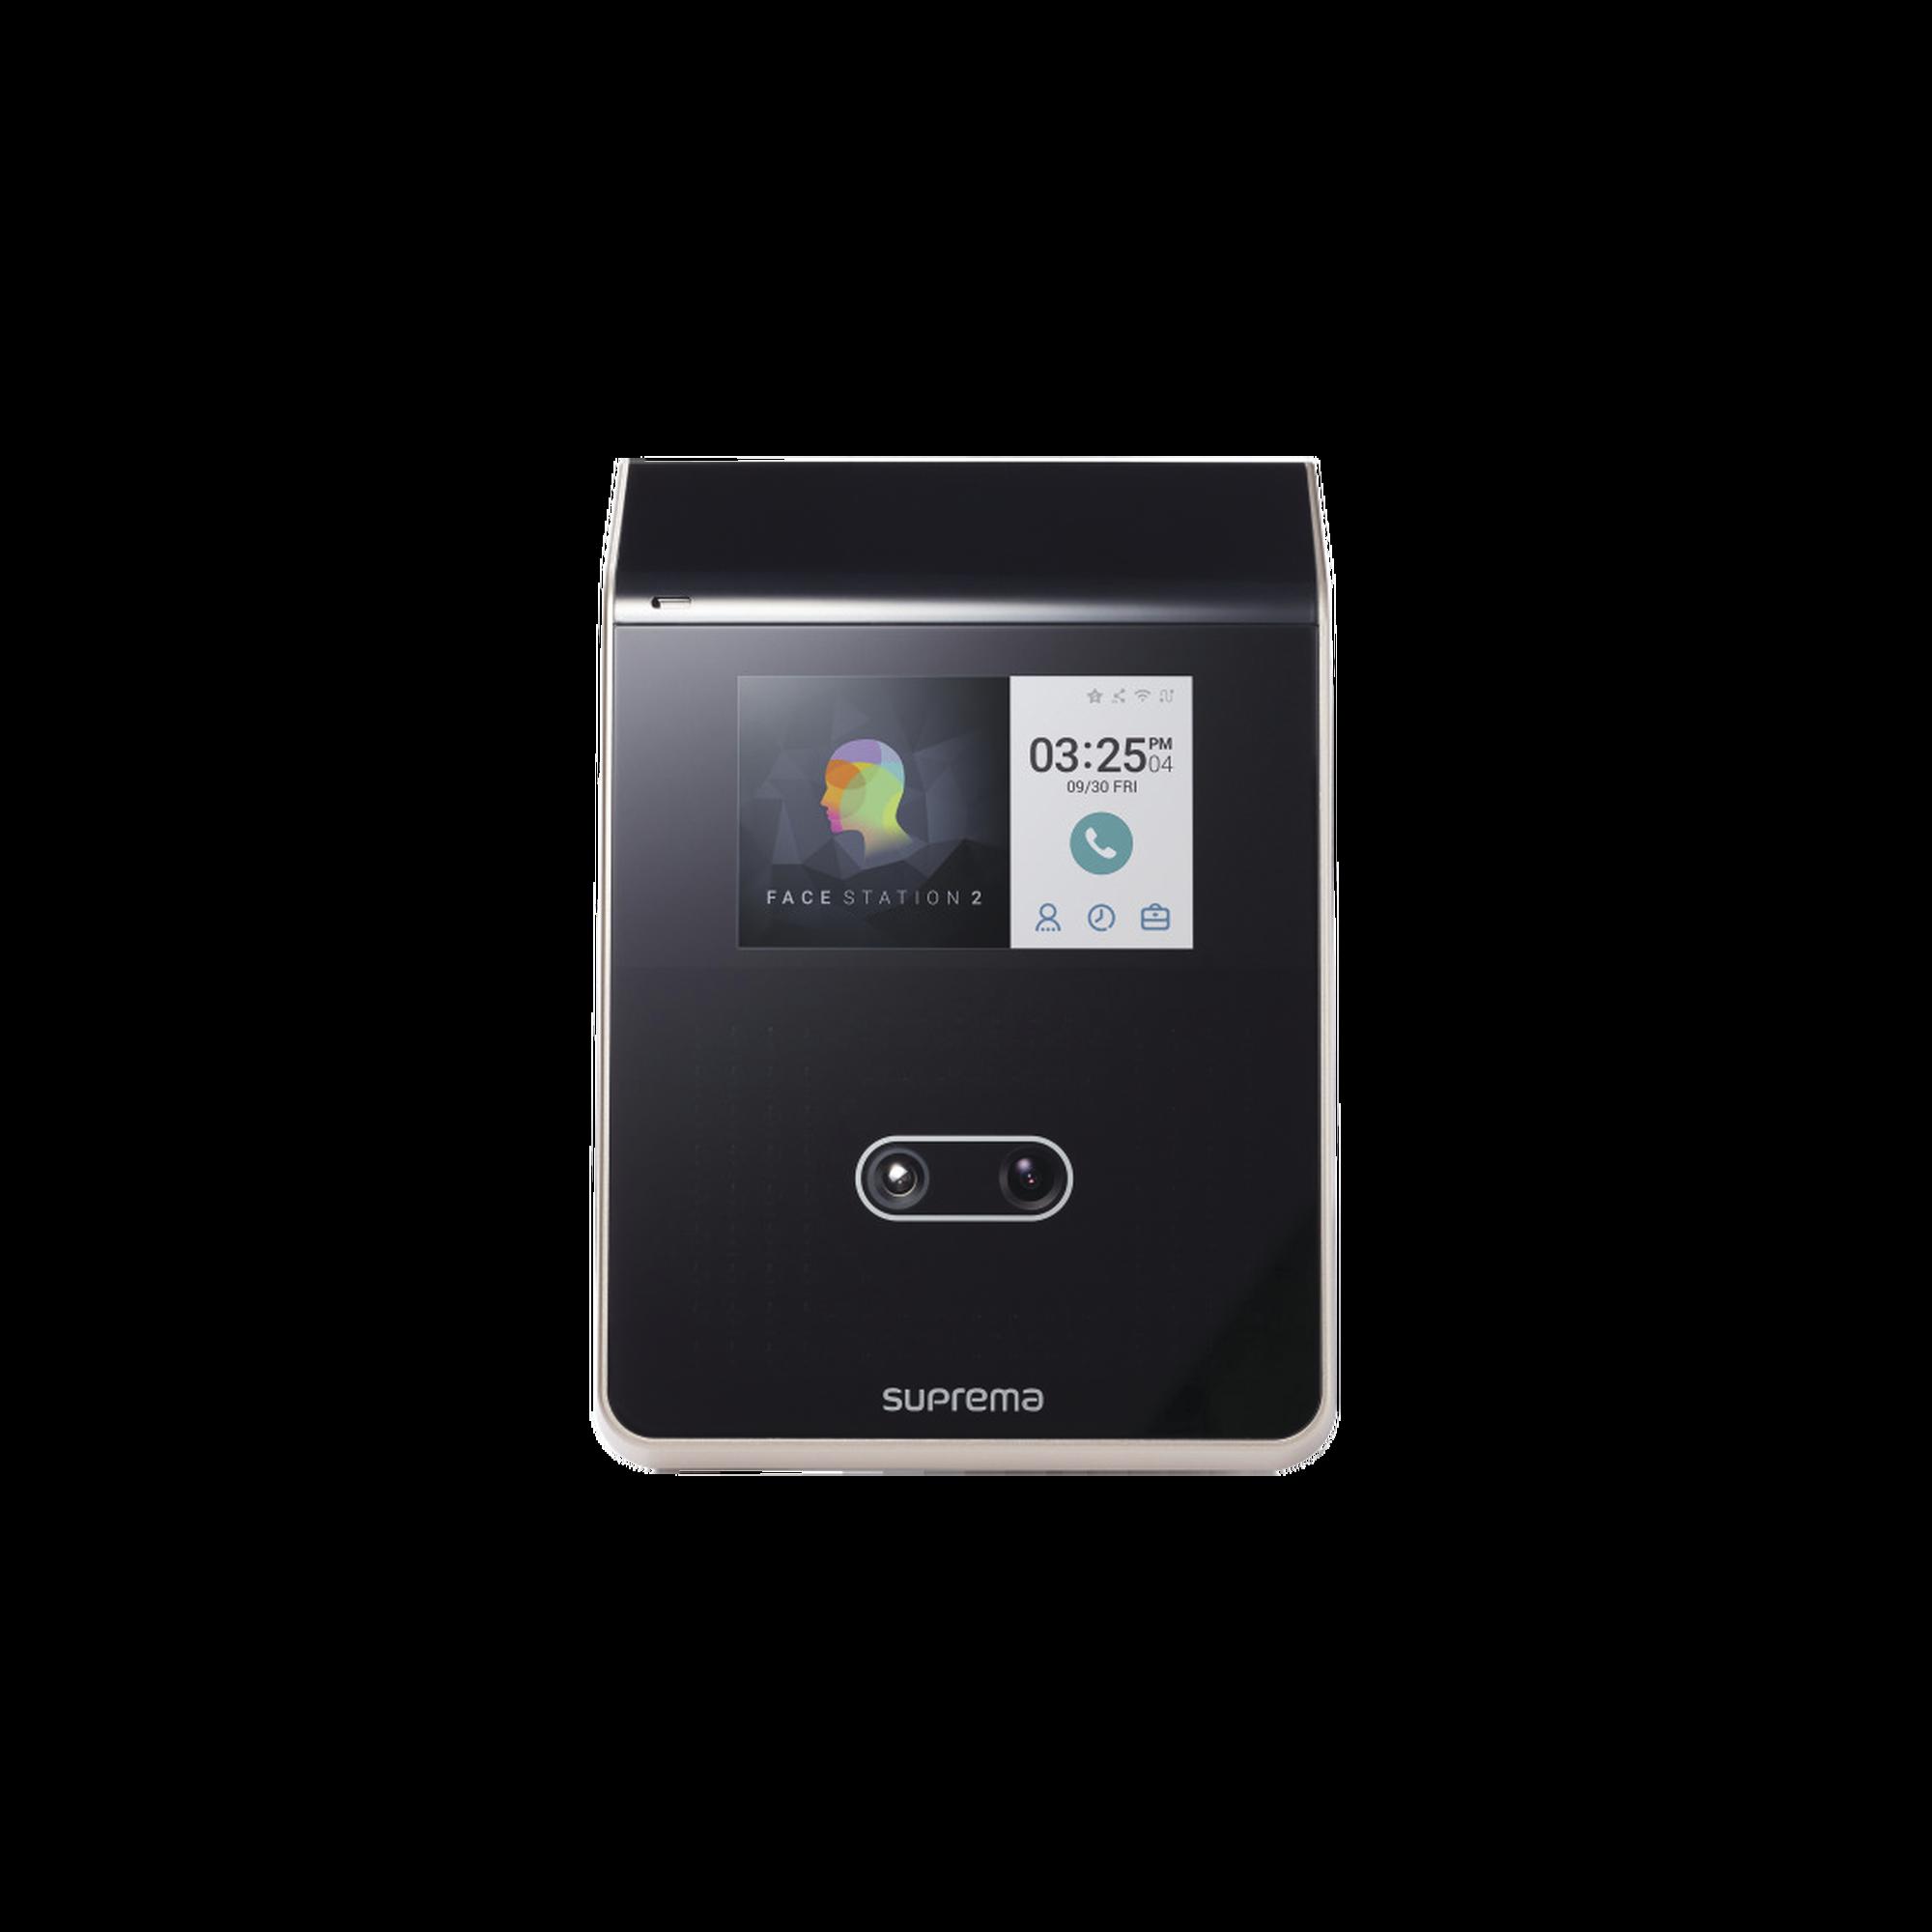 FaceStation 2 Lector Facial Multiclass SE Dual RFID (125KHZ EM HID Prox 13.56MHZ Mifare DesFire/EV1 FeliCa iClass S Compatible con BioStar2